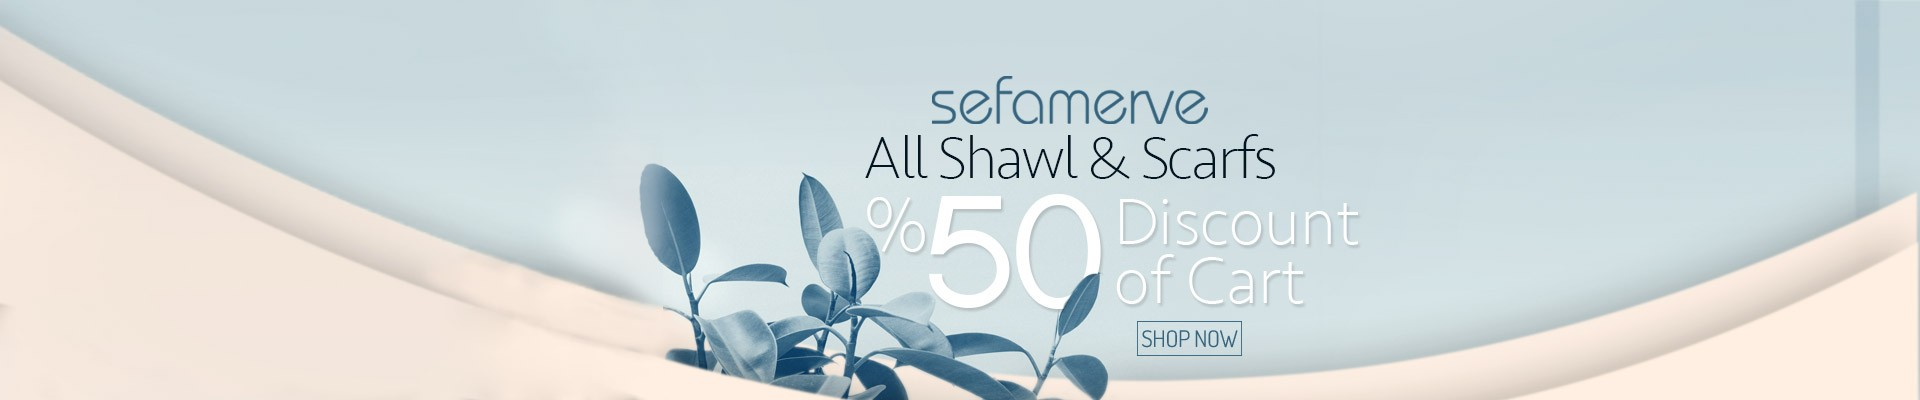 All Shawl & Scarfs %50 Discount of Cart